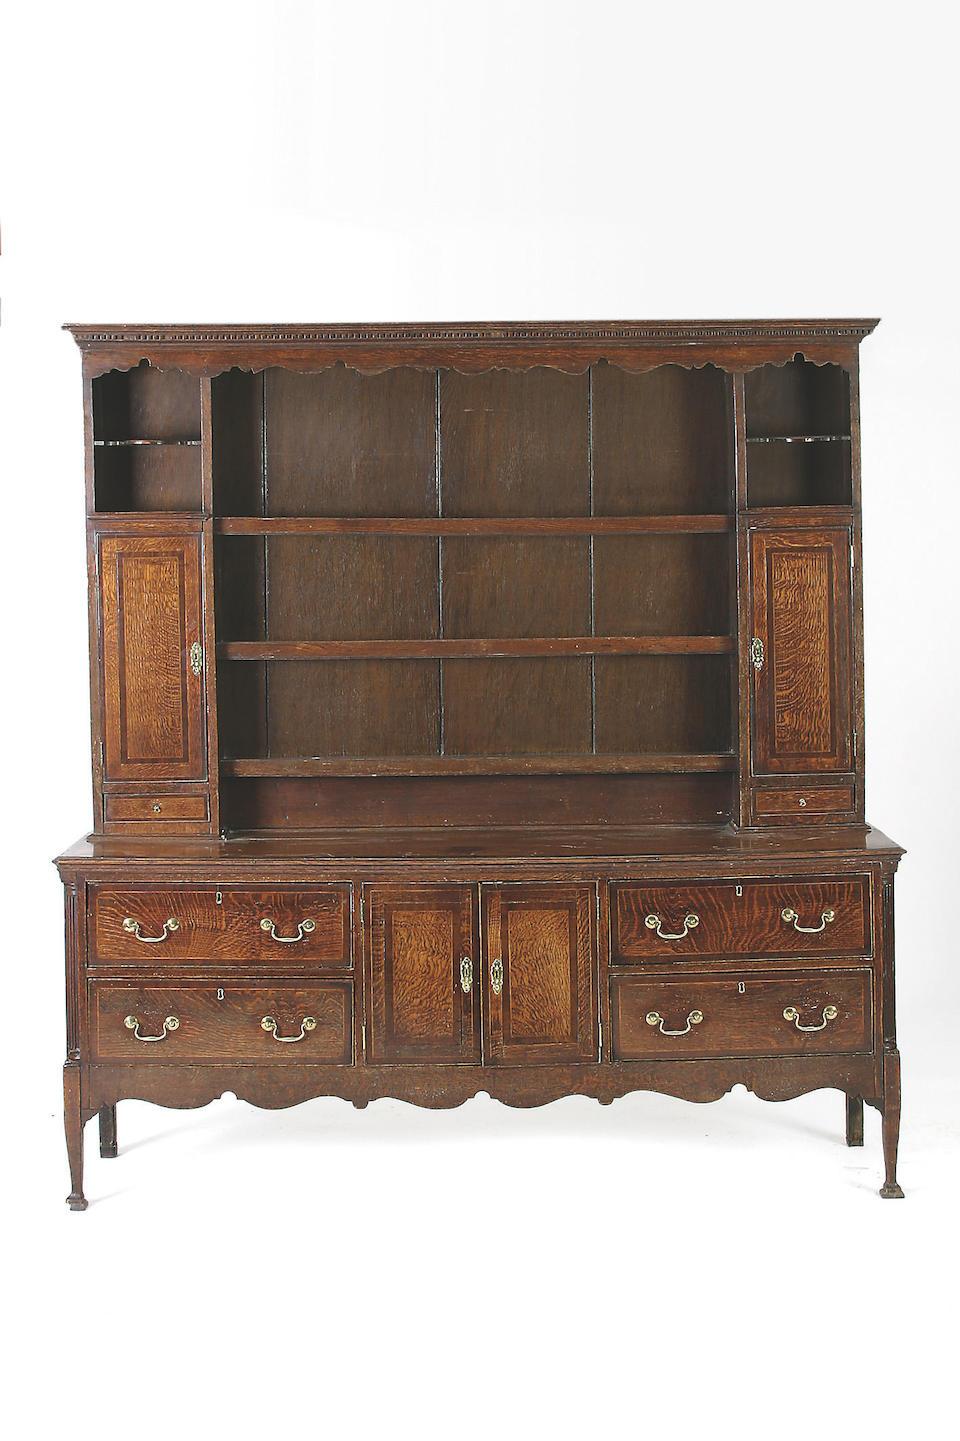 A late 18th Century oak high dresser